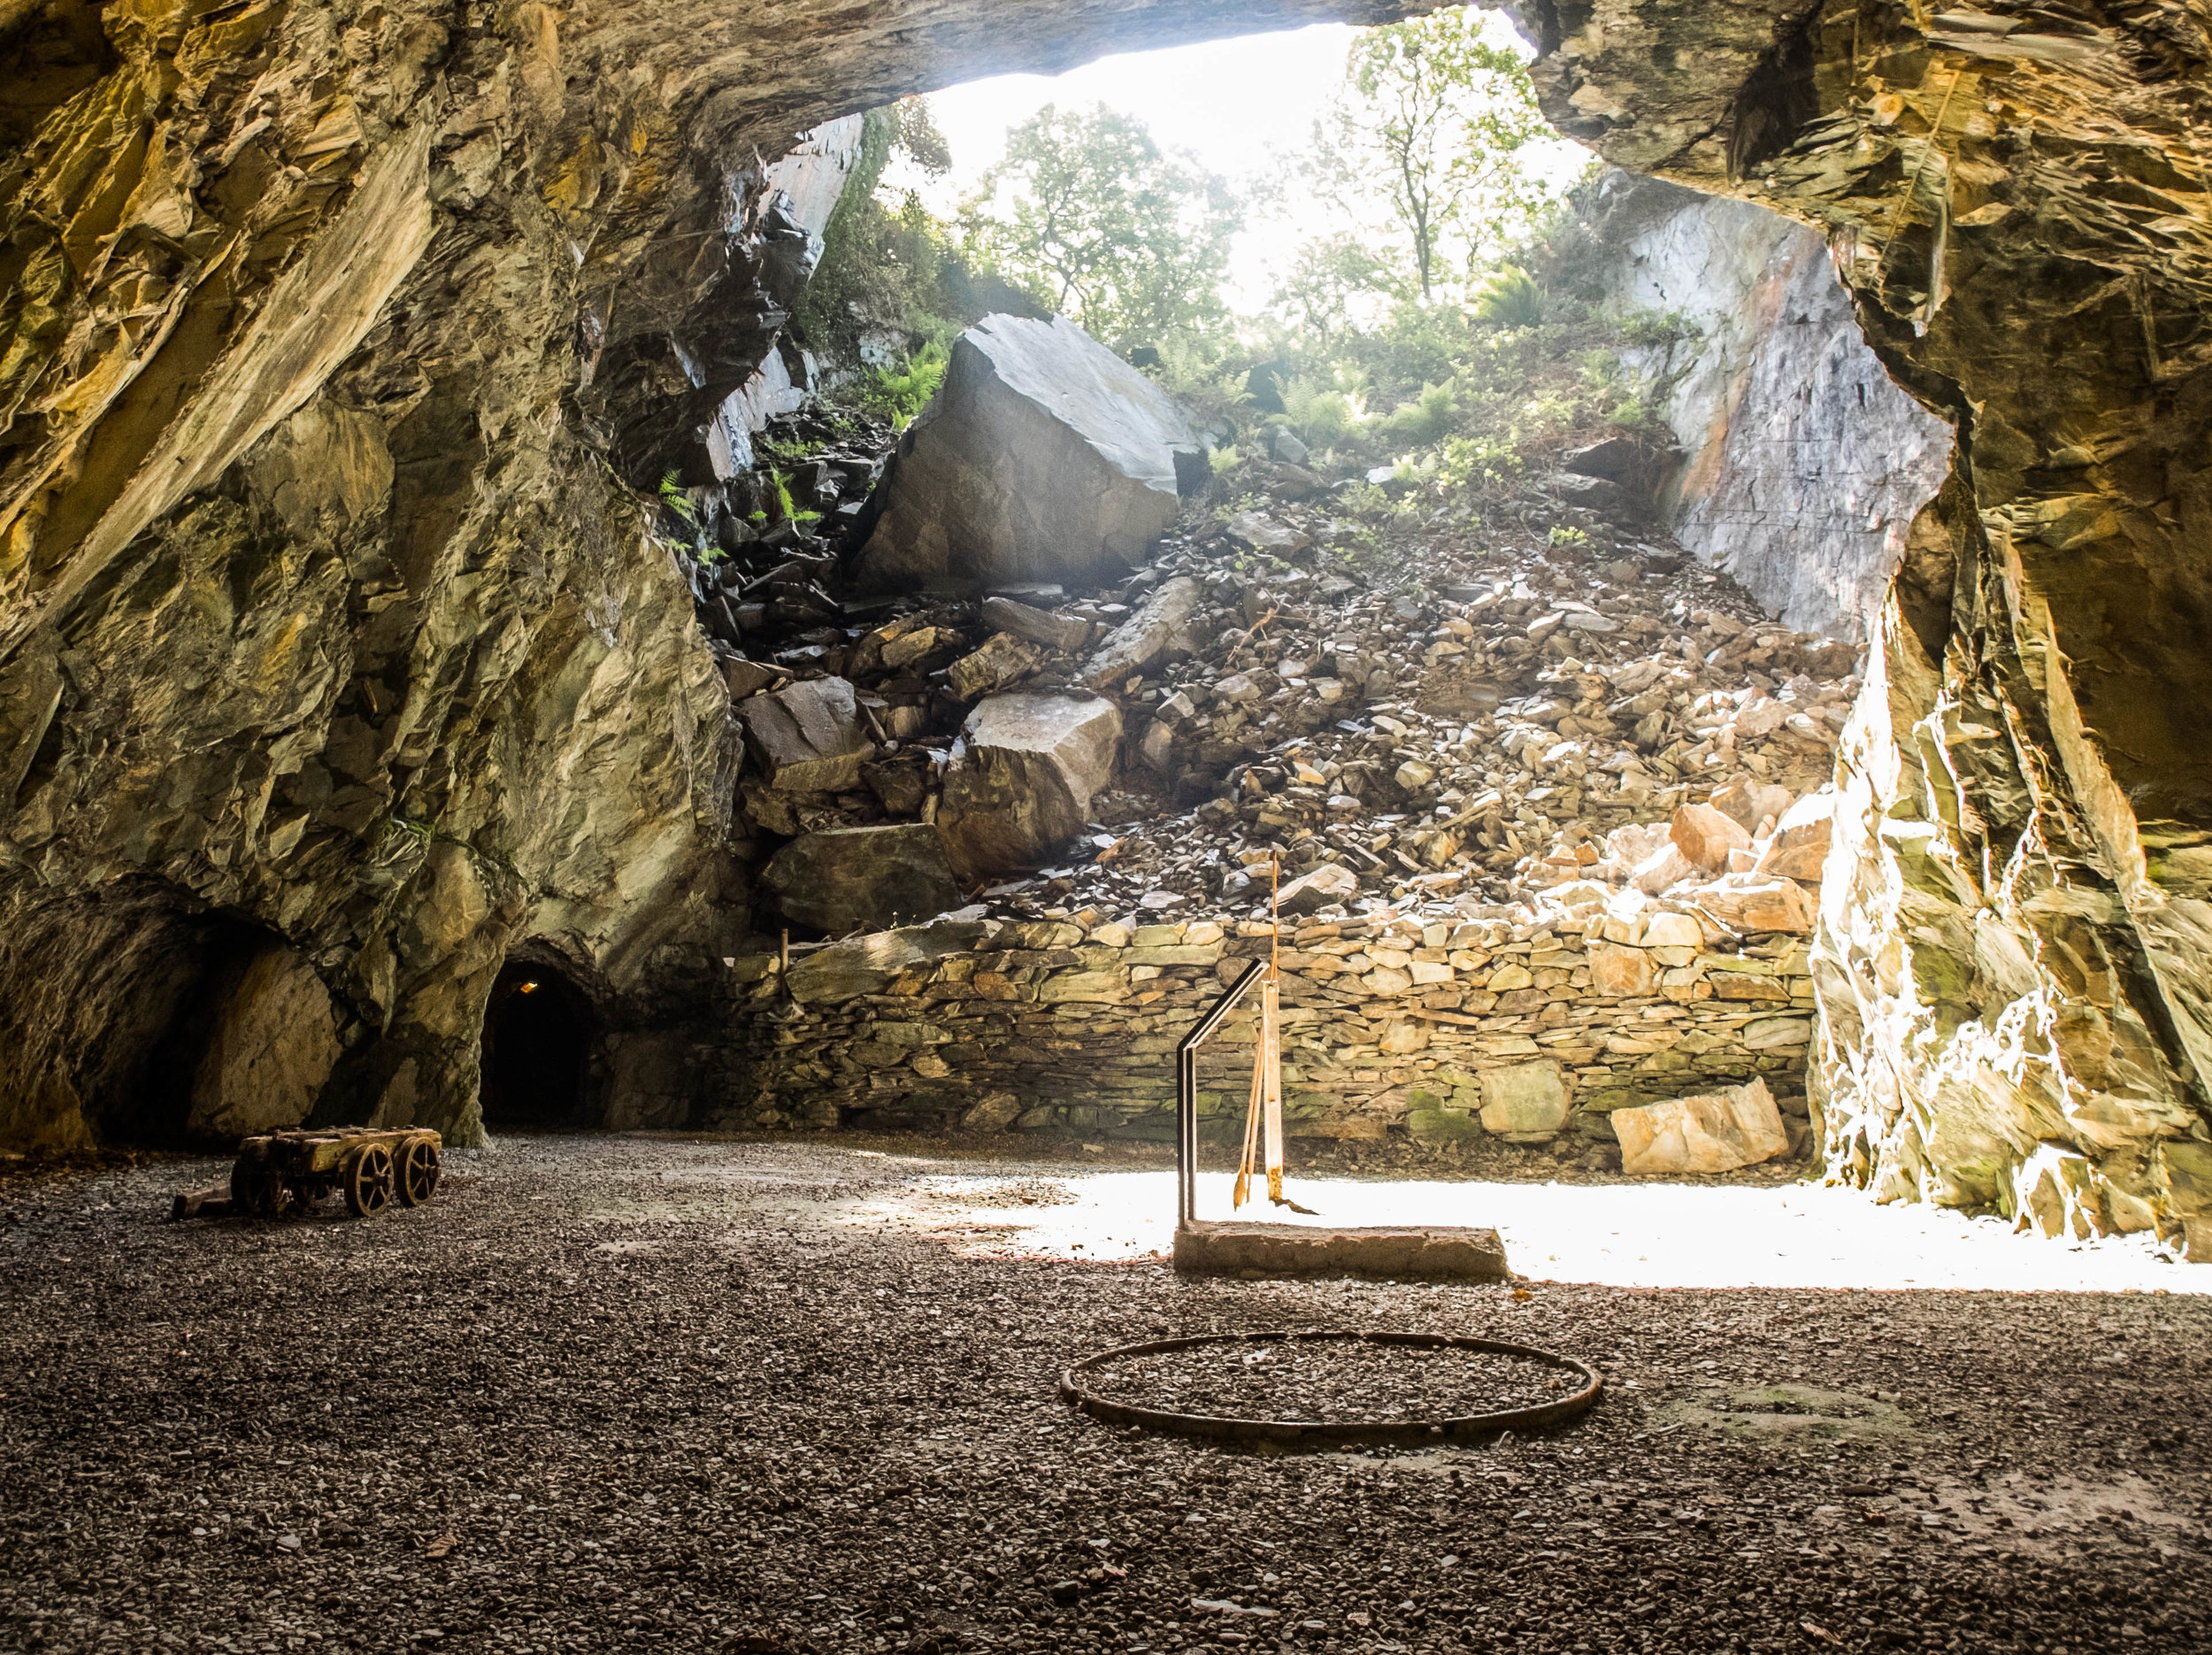 Llanfair Slate Caverns